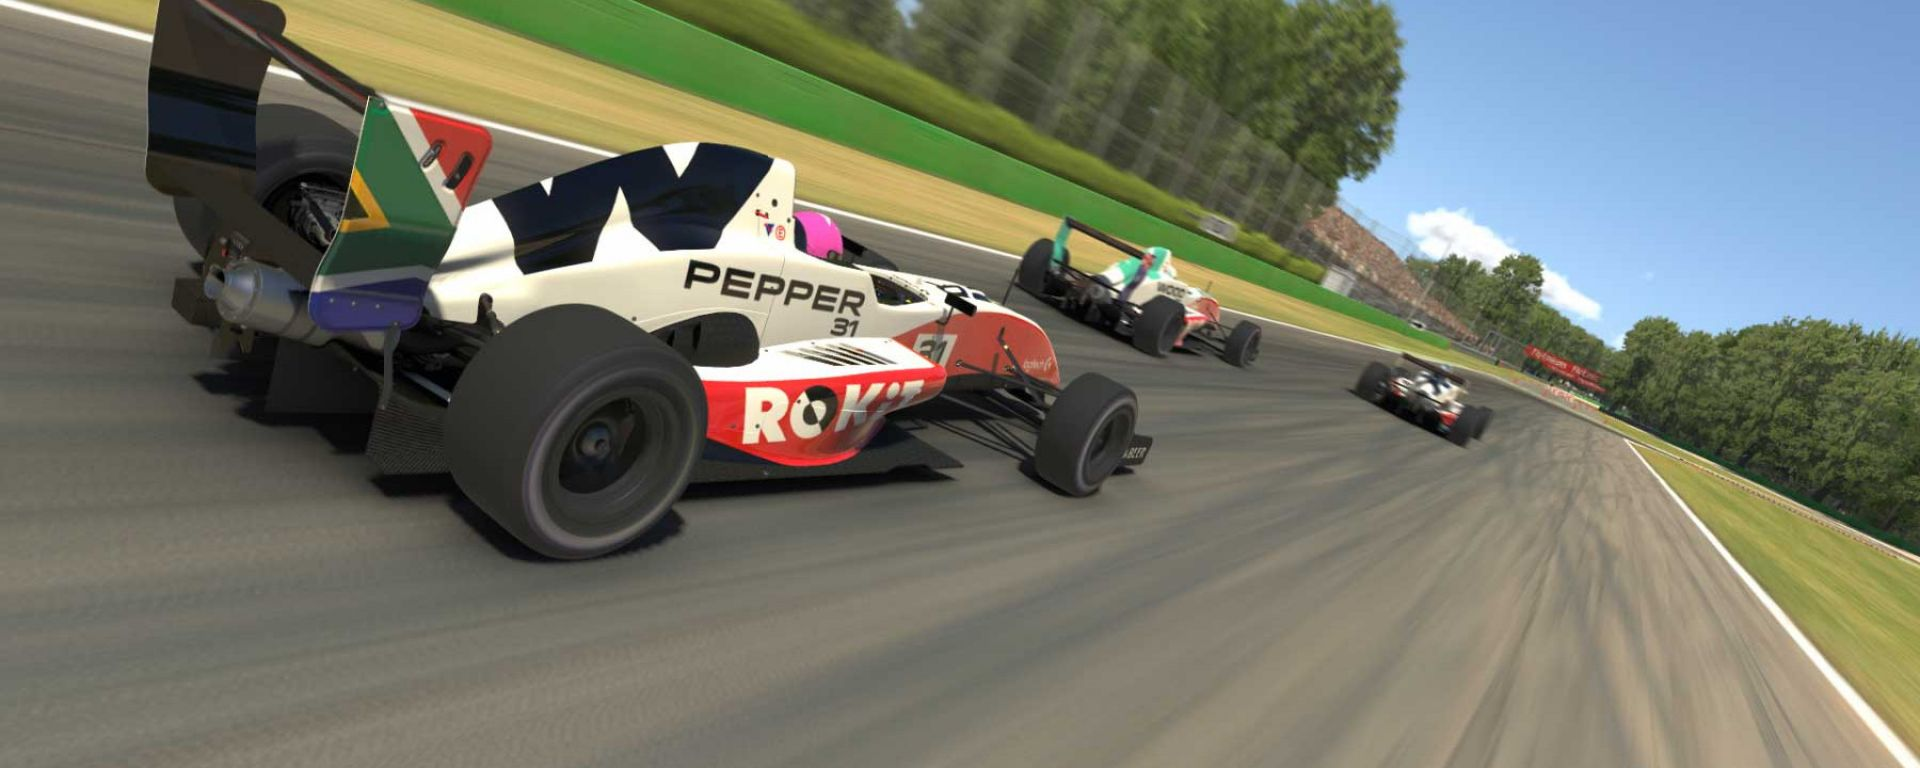 W Series Esports 2020, immagini dal simulatore iRacing | Foto 1/6